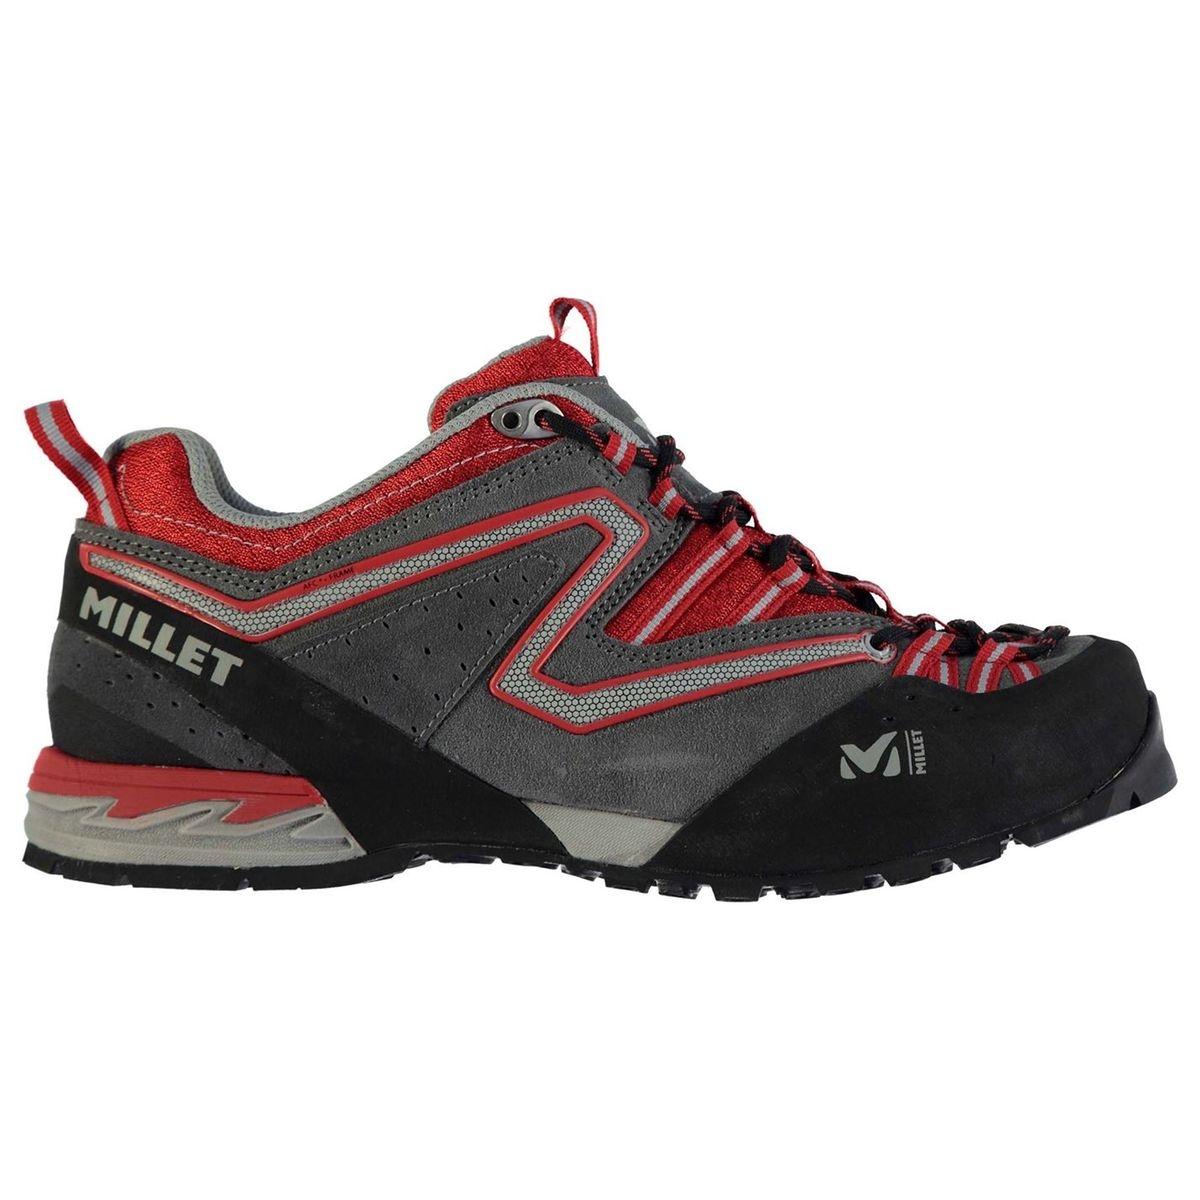 Chaussures de marche randonnée escalade